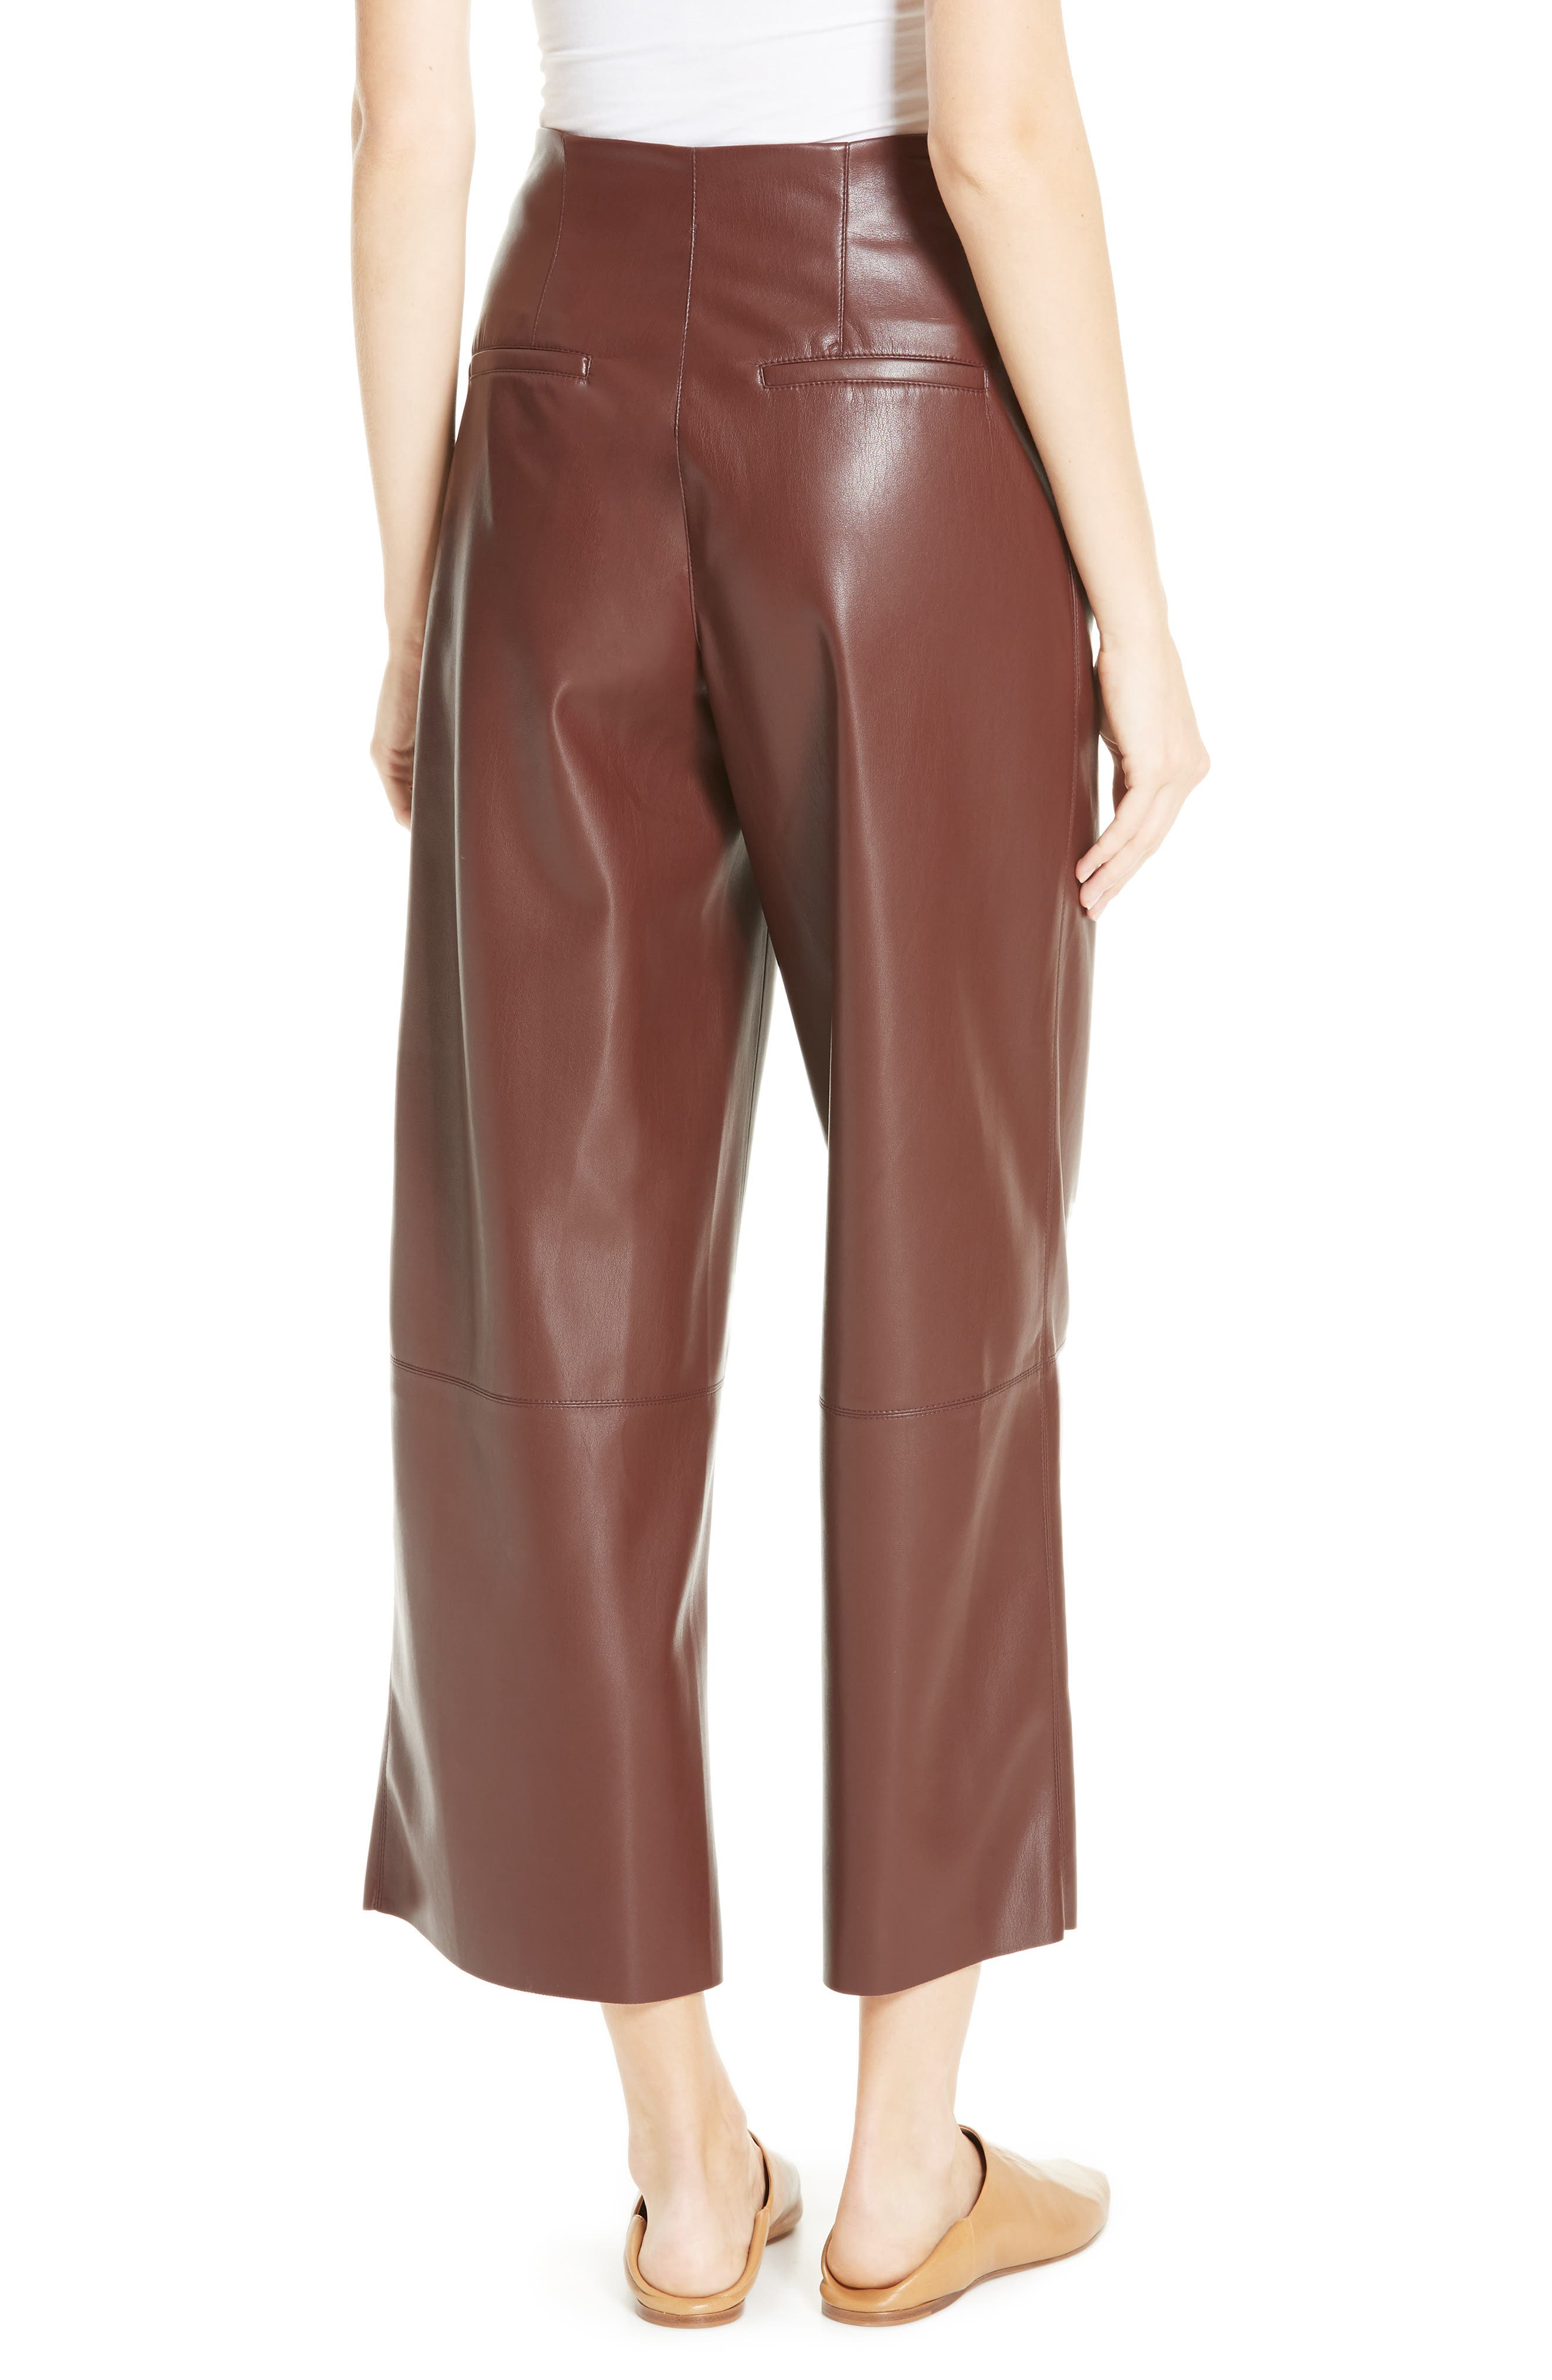 Africa Faux Leather Wide Leg Crop Pants,                             Alternate thumbnail 2, color,                             PLUM CHUTNEY